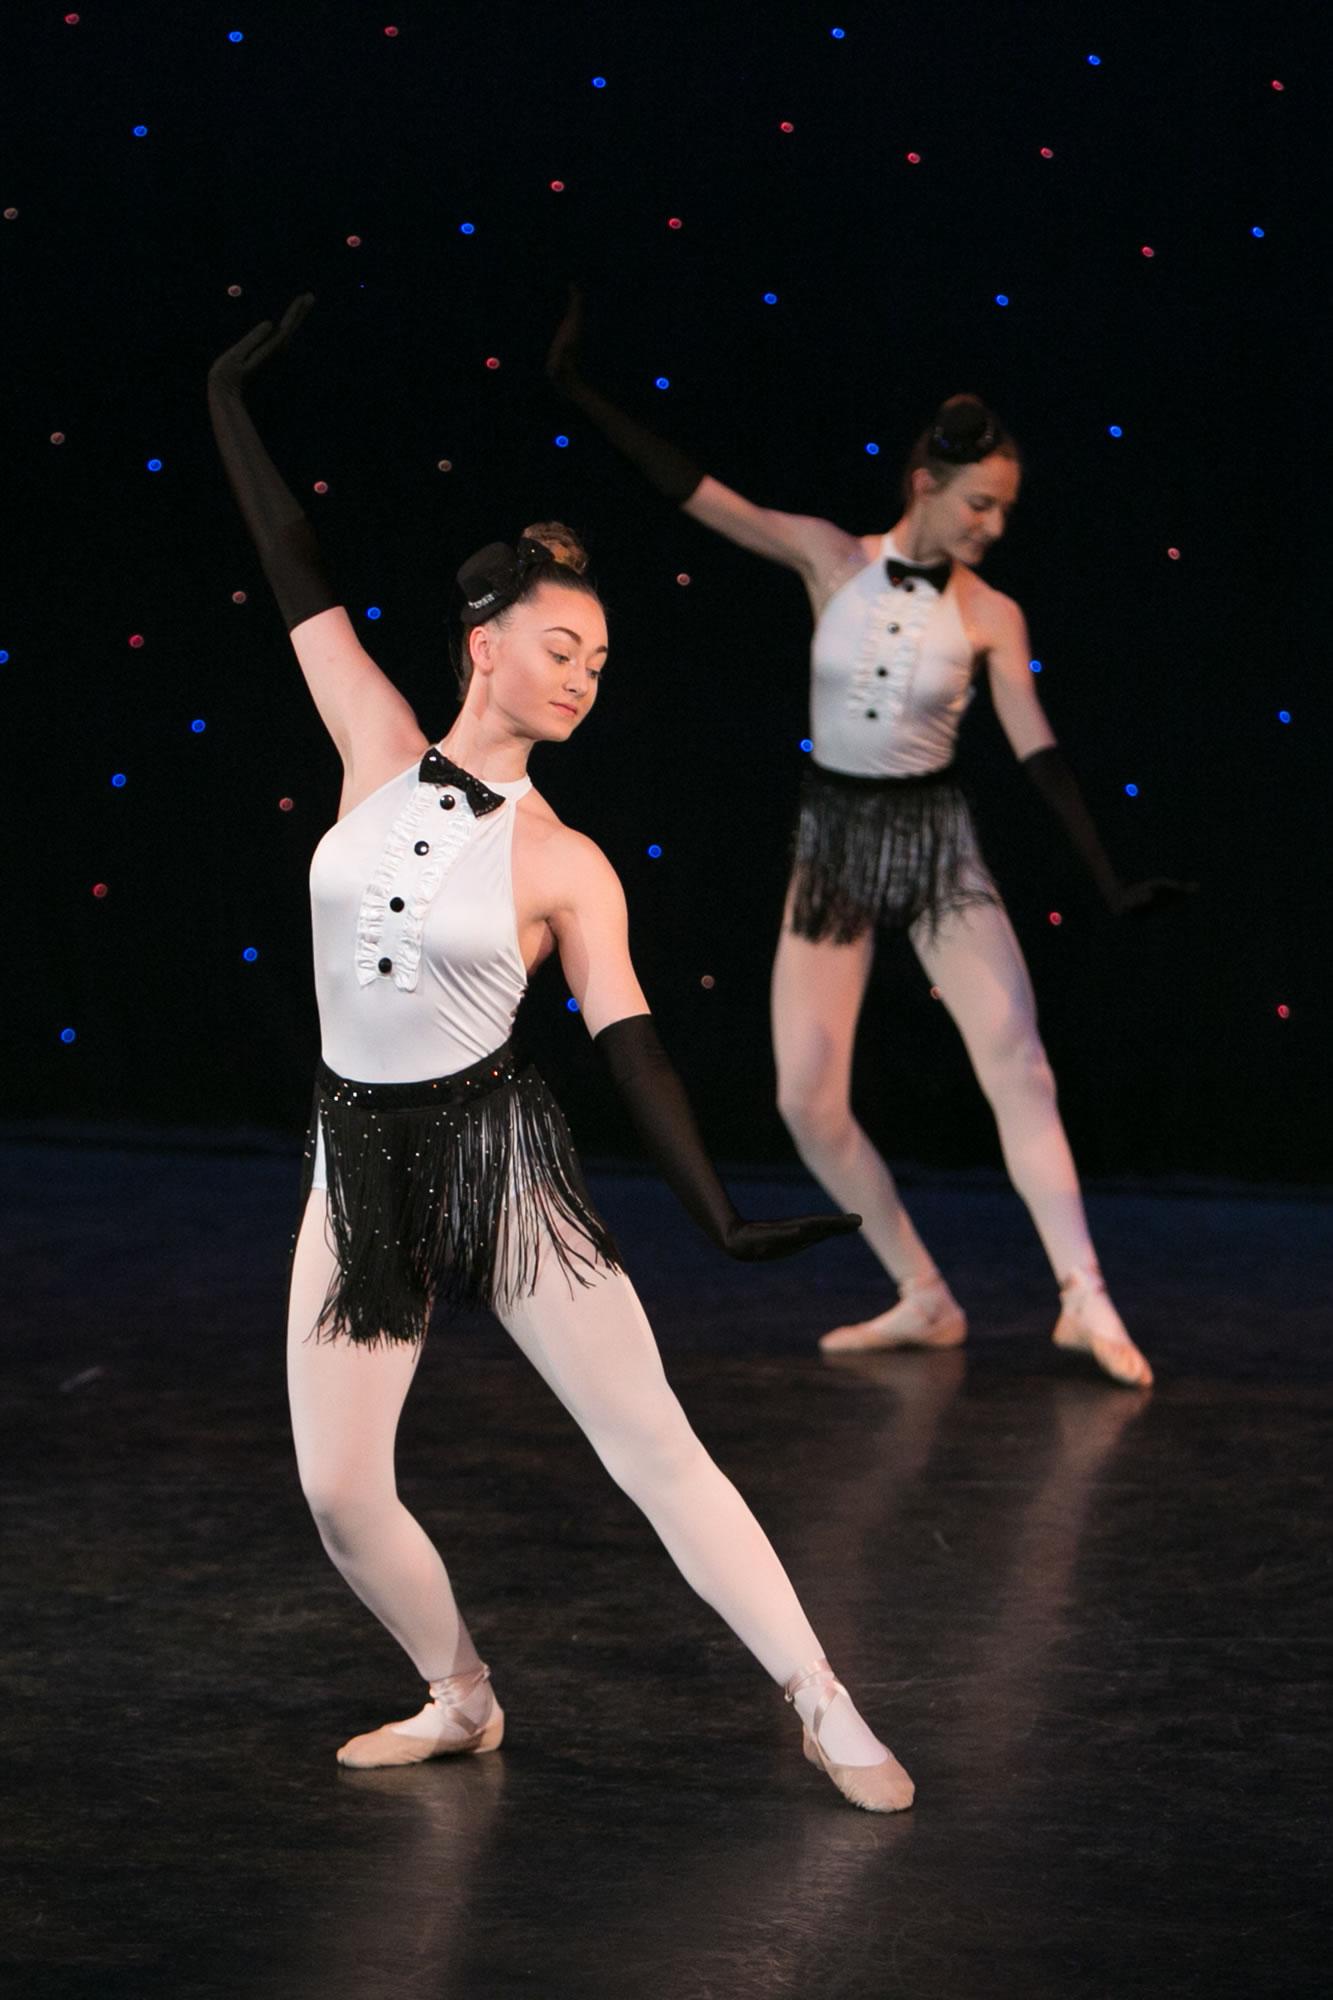 Hitchin_School_of_Dance_Show_2019-SM1_3143.jpg